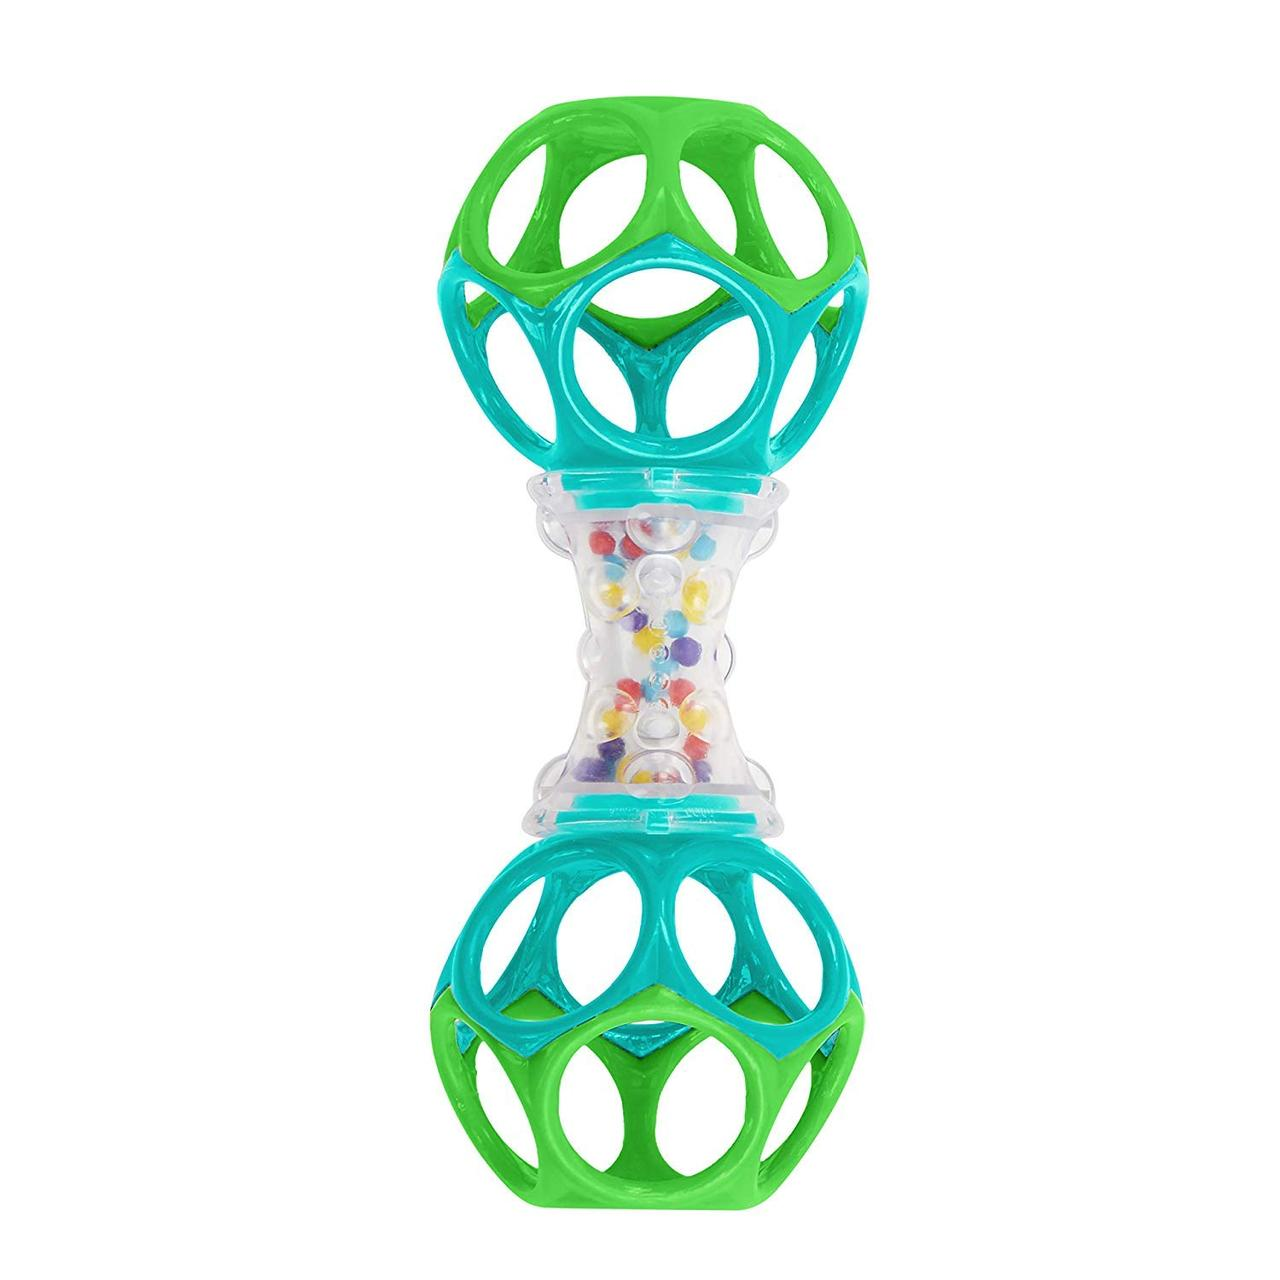 Брязкальце O Ball Bright Starts Oball Shaker Rattle Toy